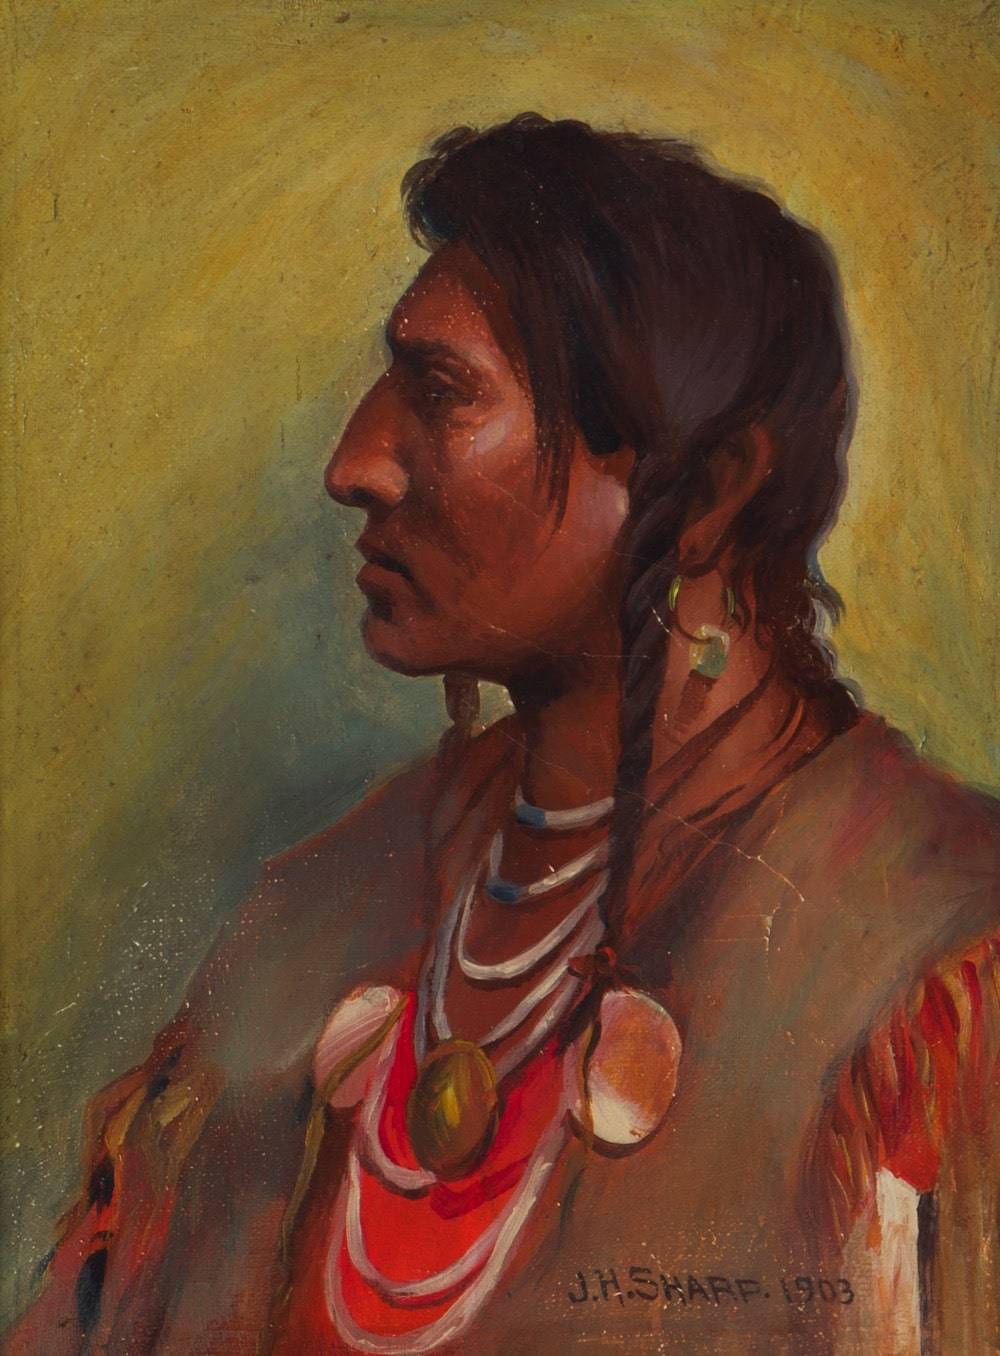 Joseph Henry Sharp (1859-1953 Pasadena, CA)